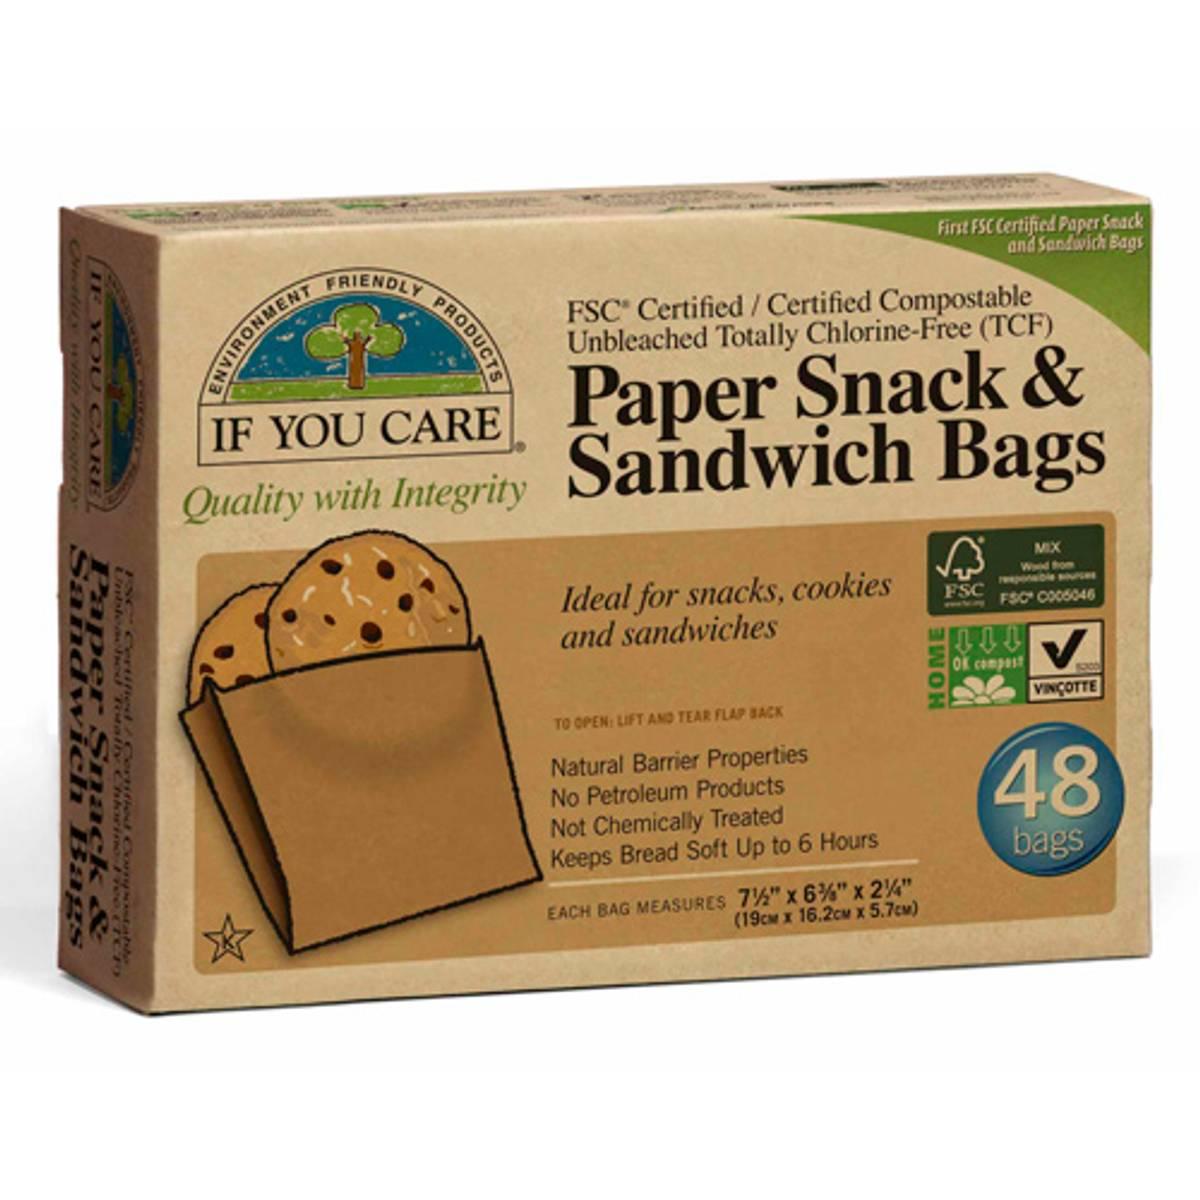 Papirposer ubleket 48 stk / If You Care